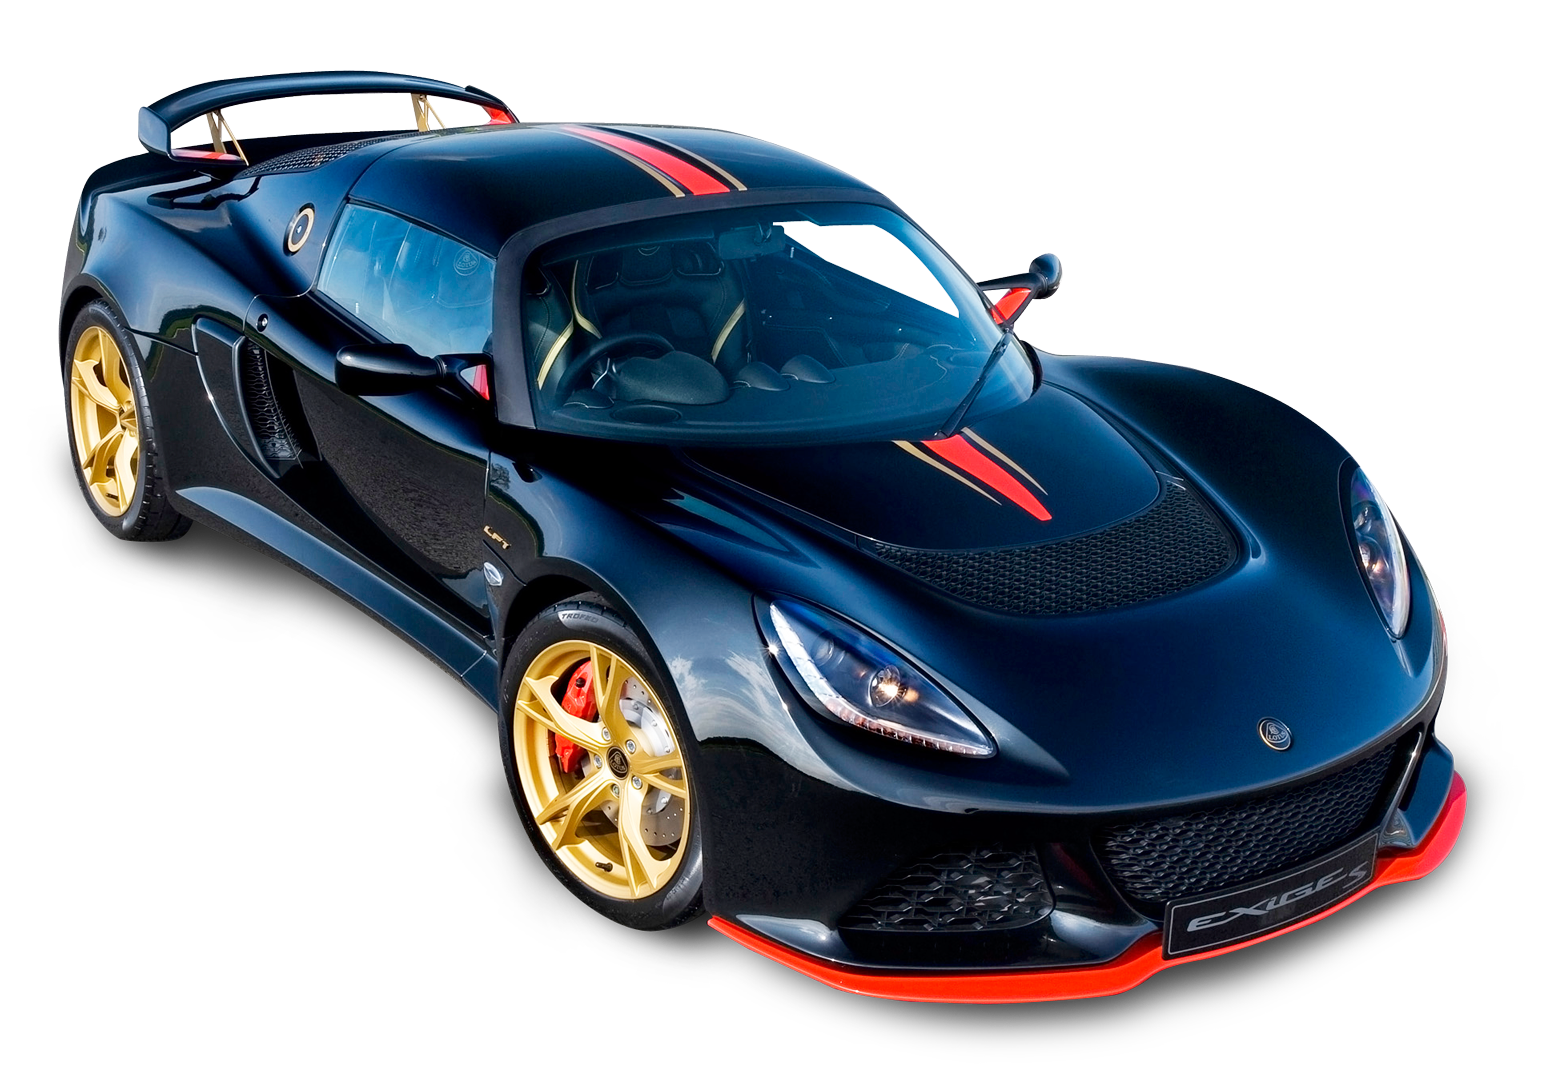 Black Lotus Exige LF1 Car